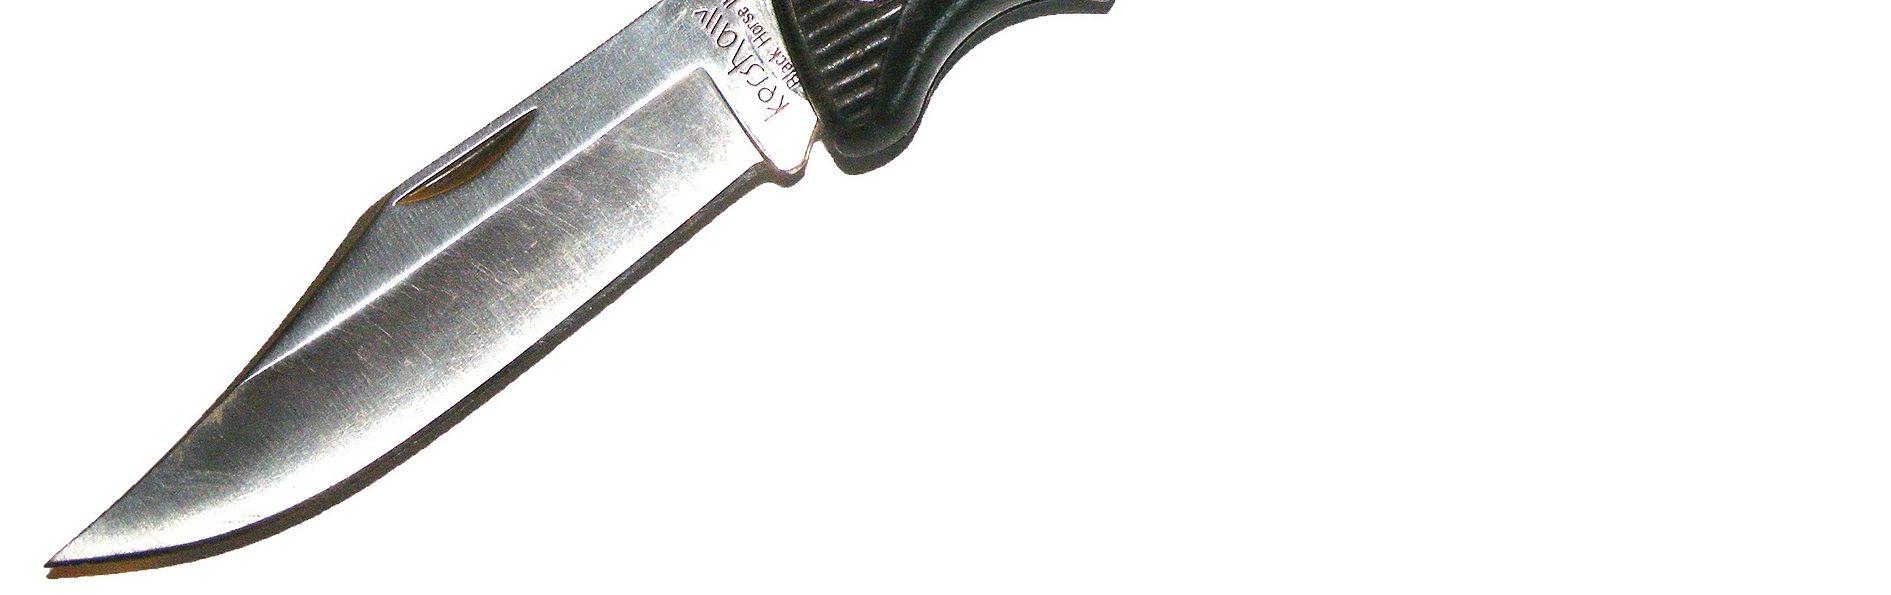 edc knife lightweight